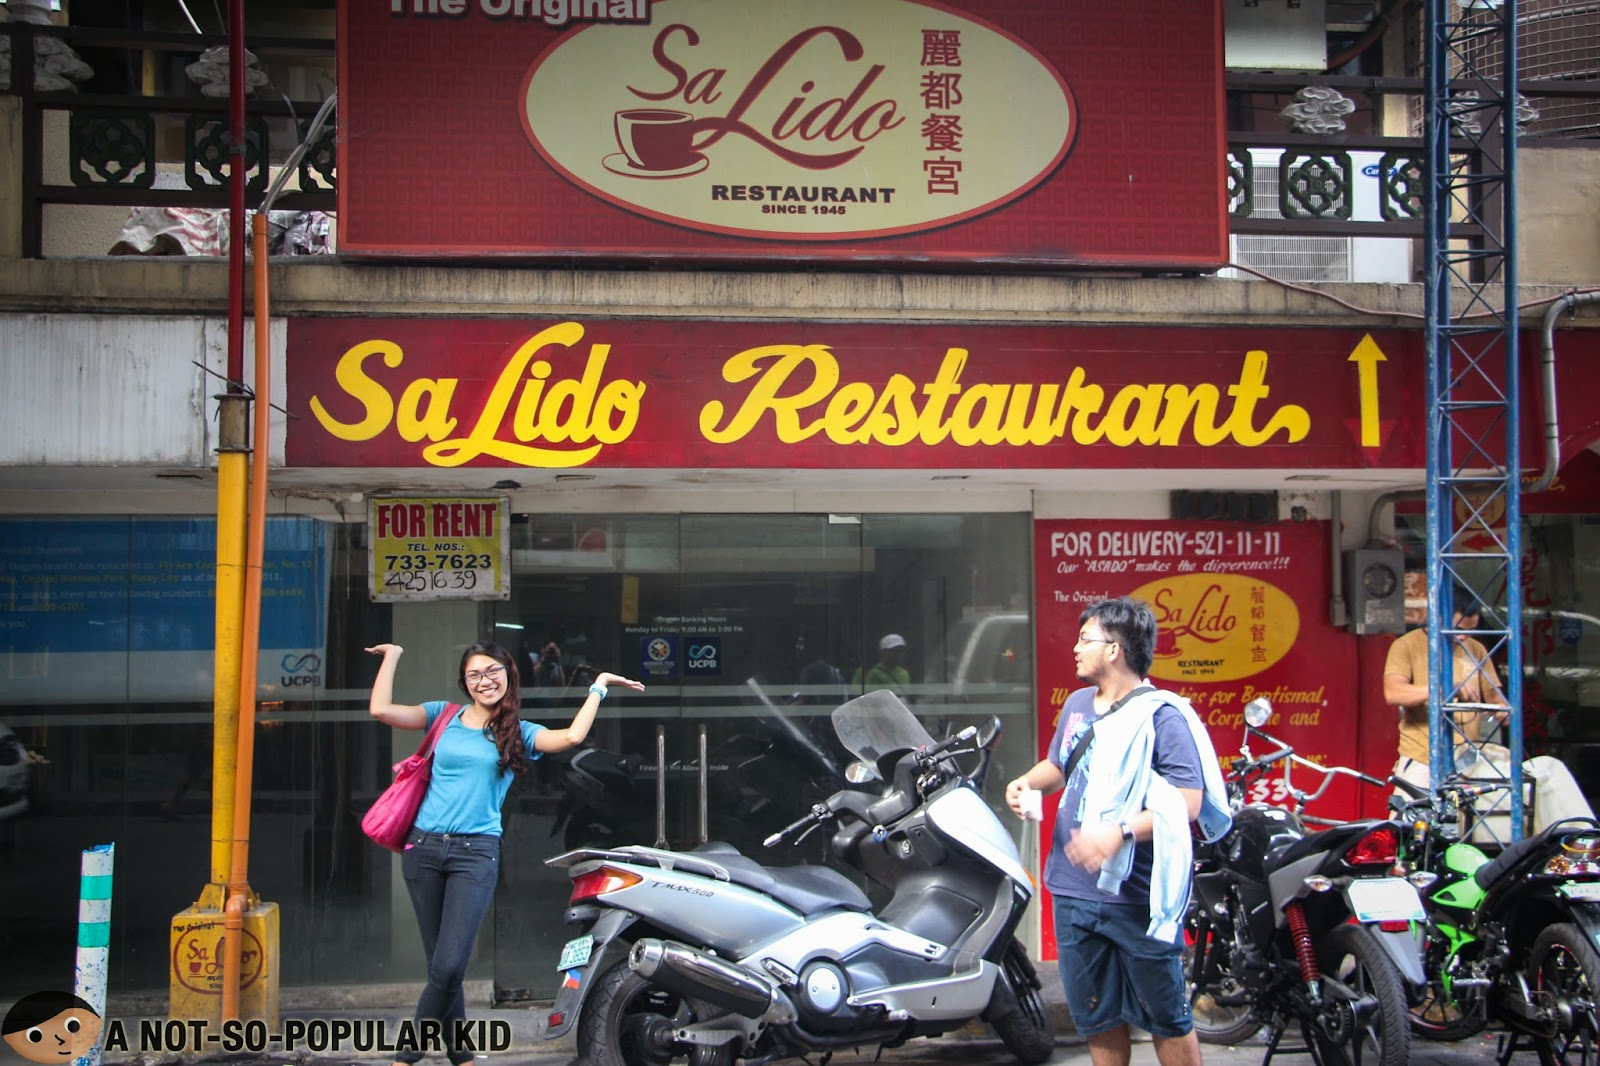 The Original Sa Lido Restaurant in Ongpin Street of Binondo, Manila